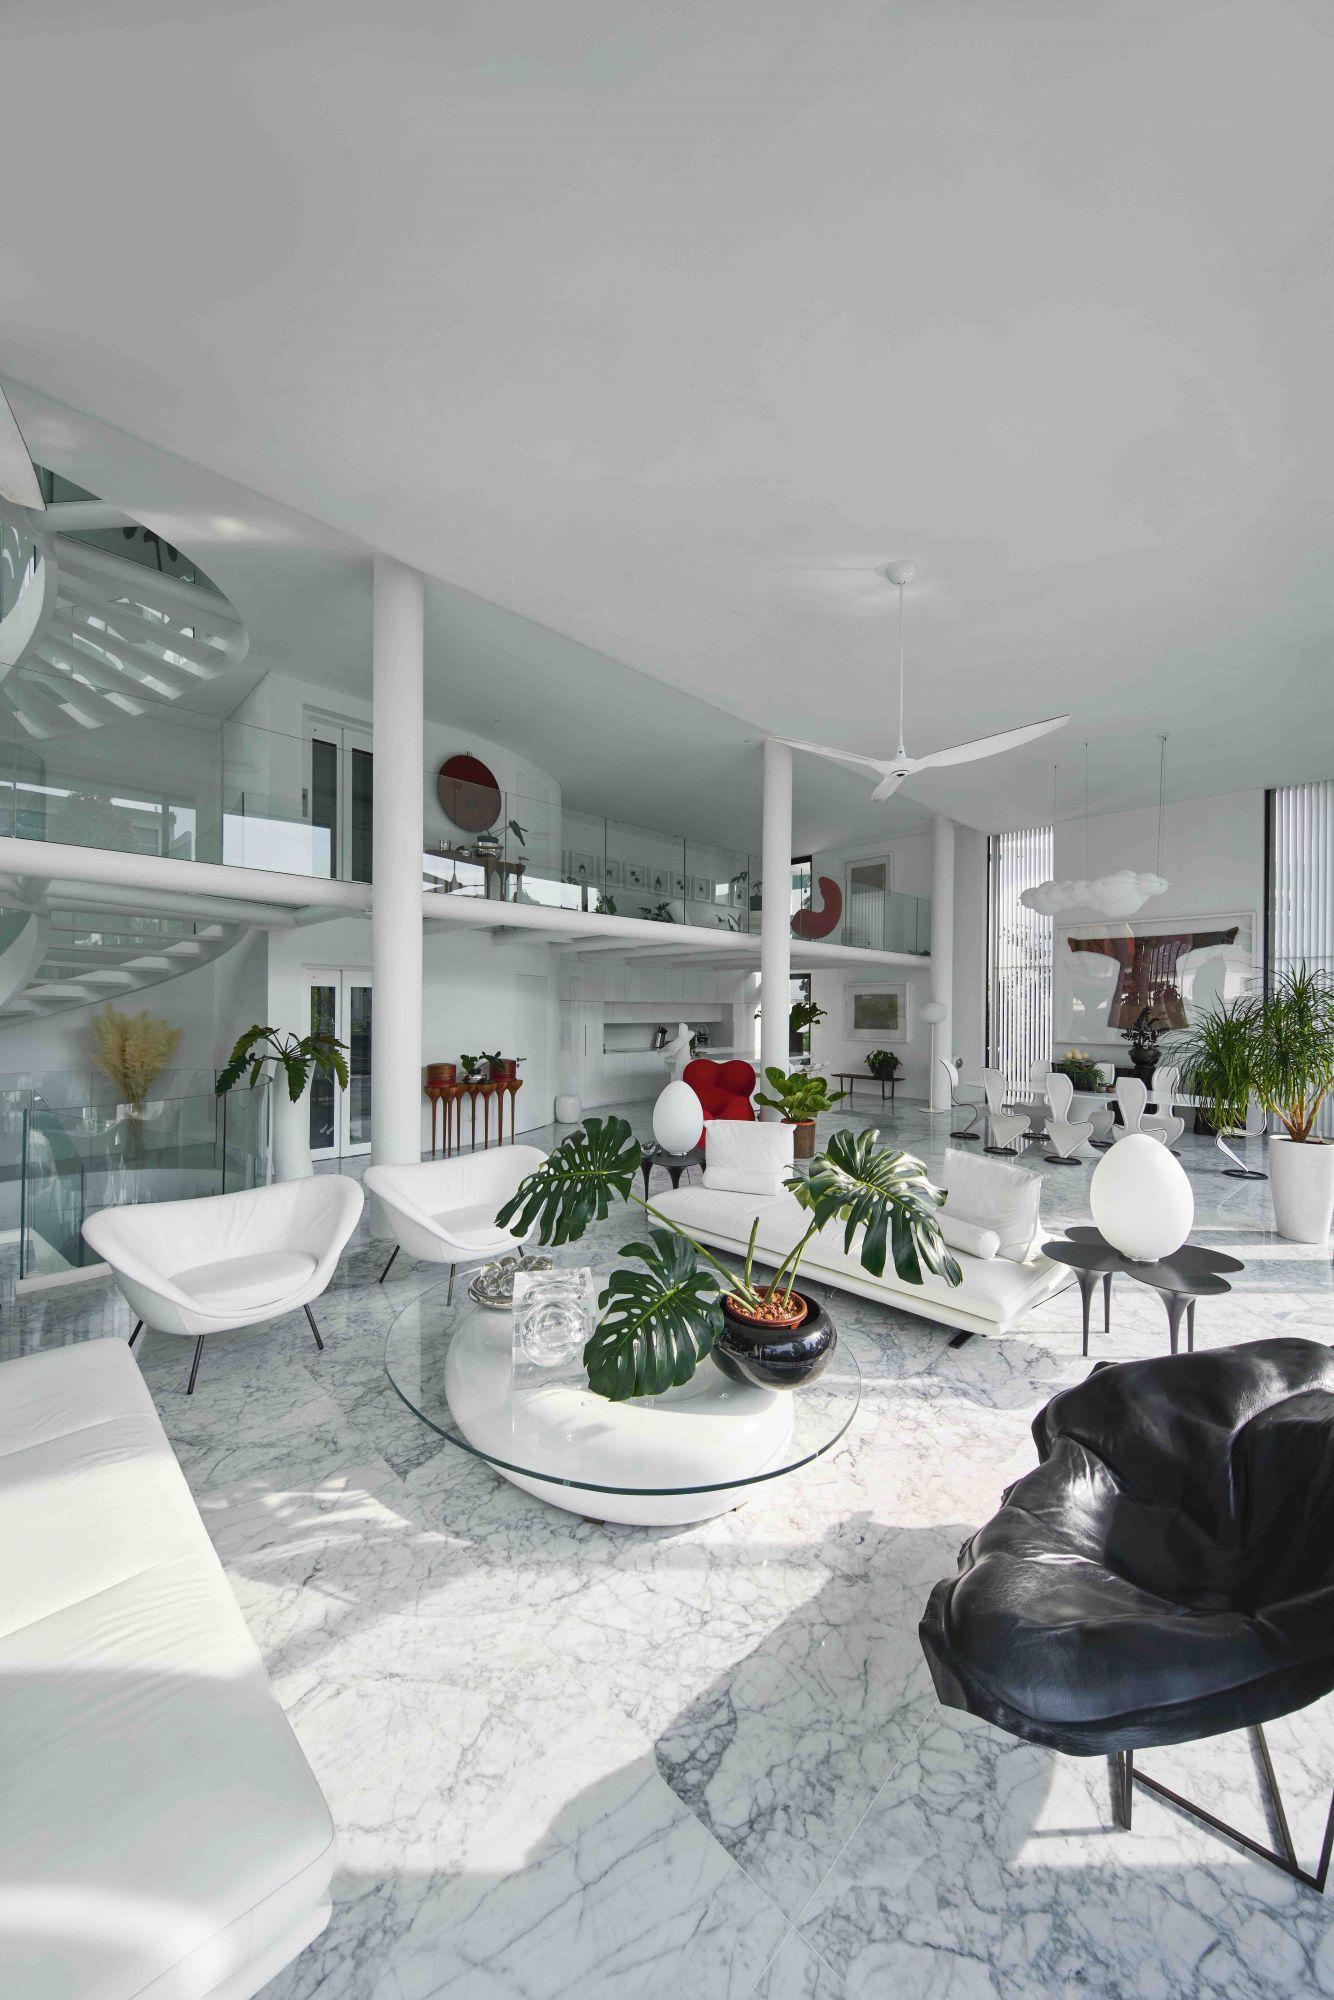 Tatler 10 The Most Popular Homes In 2020 Tatler Singapore